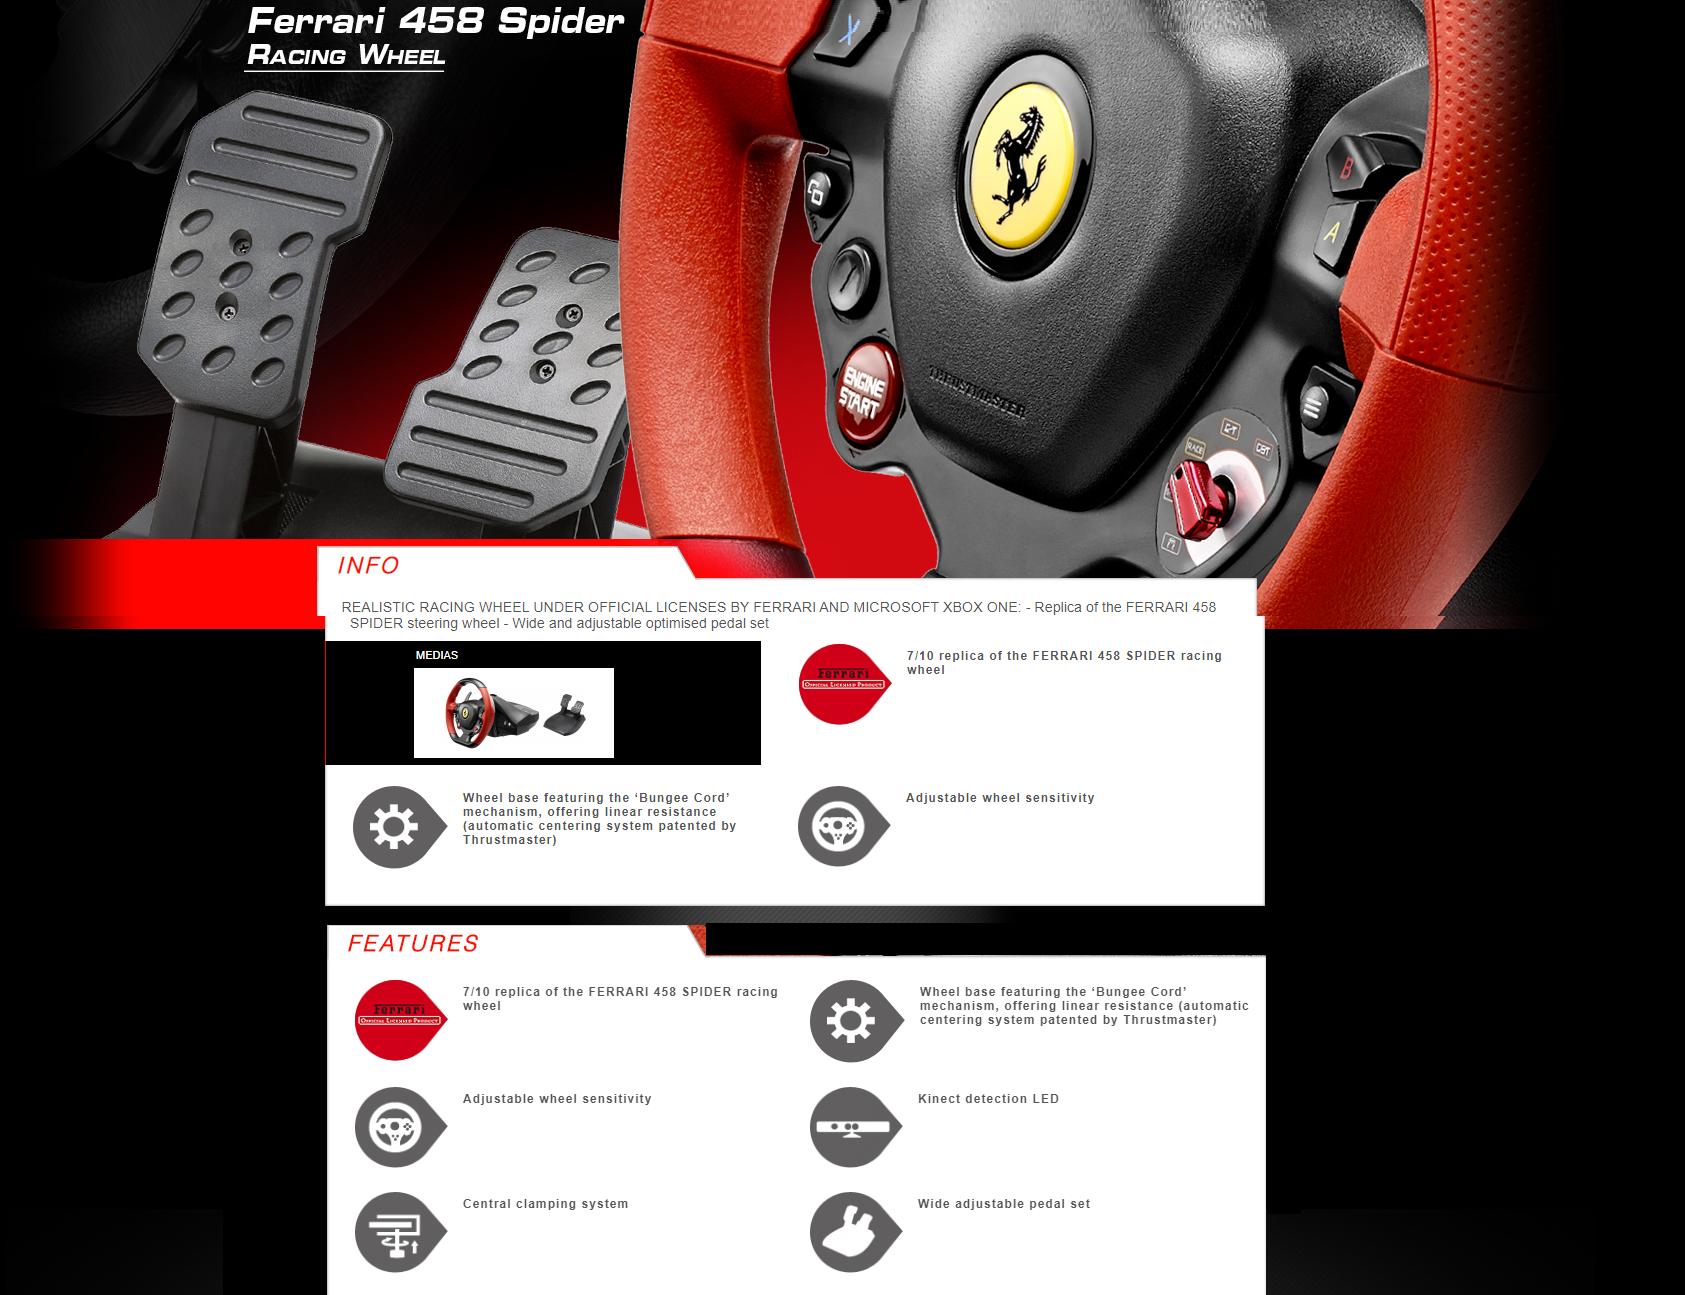 Susituokti Nėra Sudėtinga Didelis Kiekis Thrustmaster Ferrari 458 Spider Pc Yenanchen Com